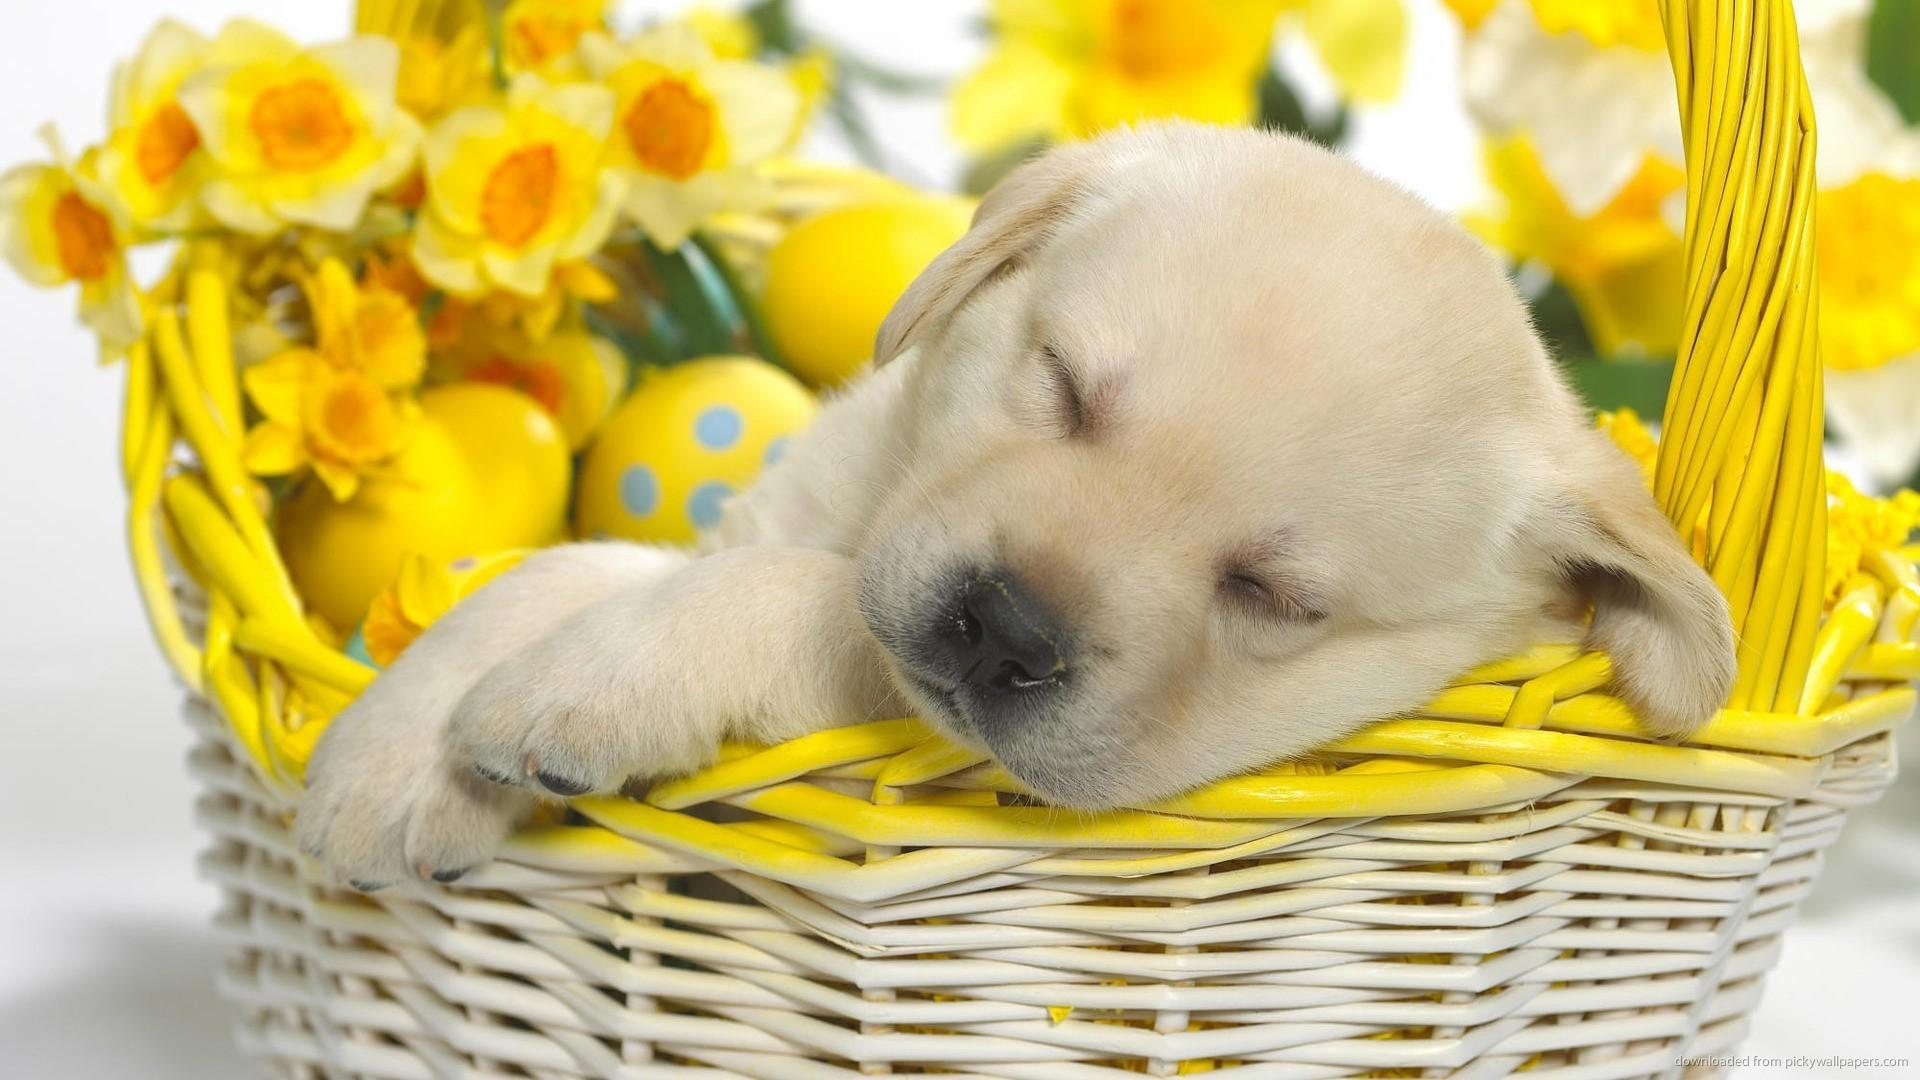 Easter Wallpaper with Cute Animals - WallpaperSafari